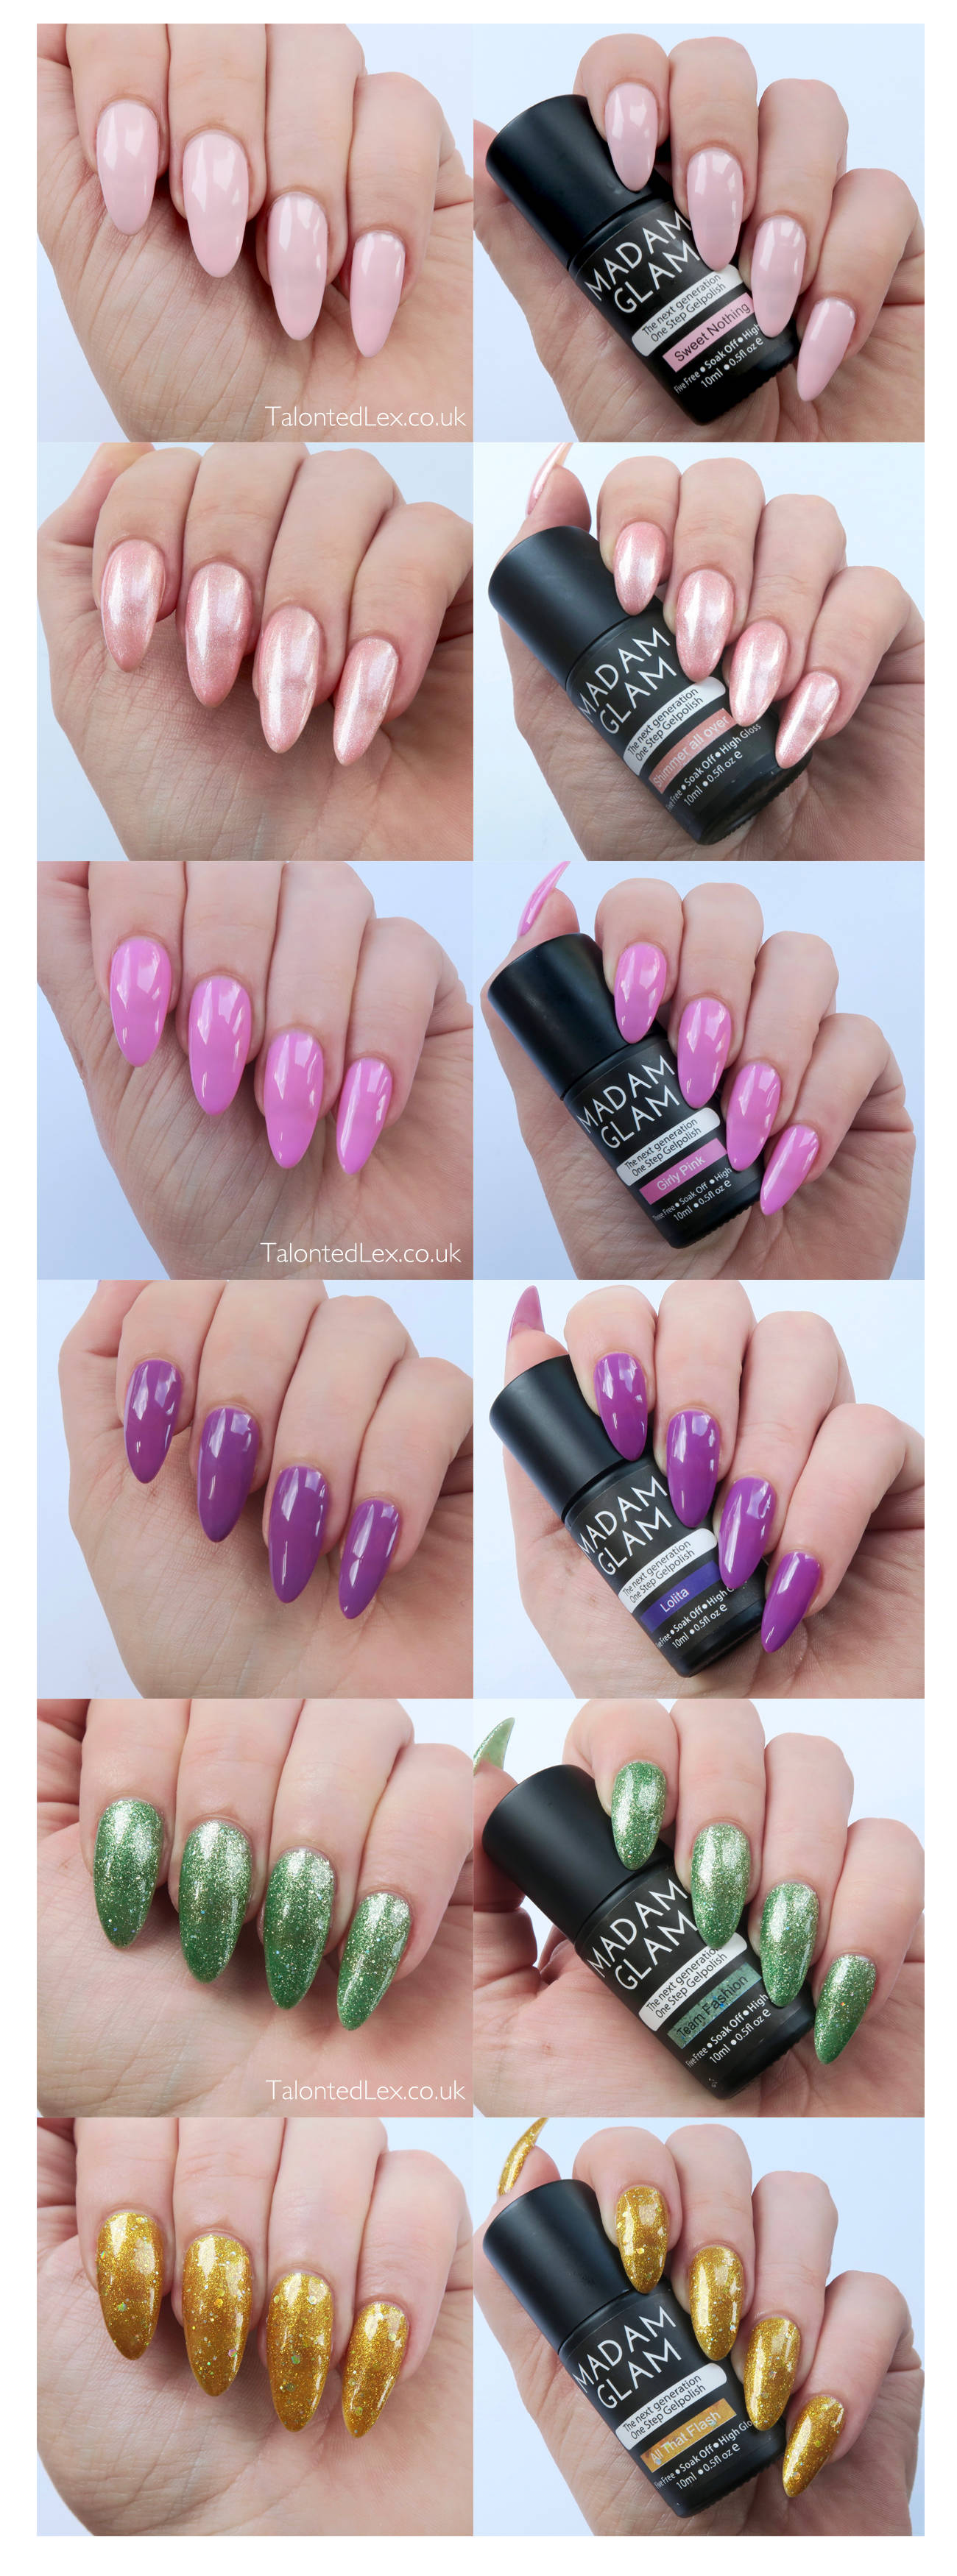 Madam-Glam-One-Step-Gels-Collage